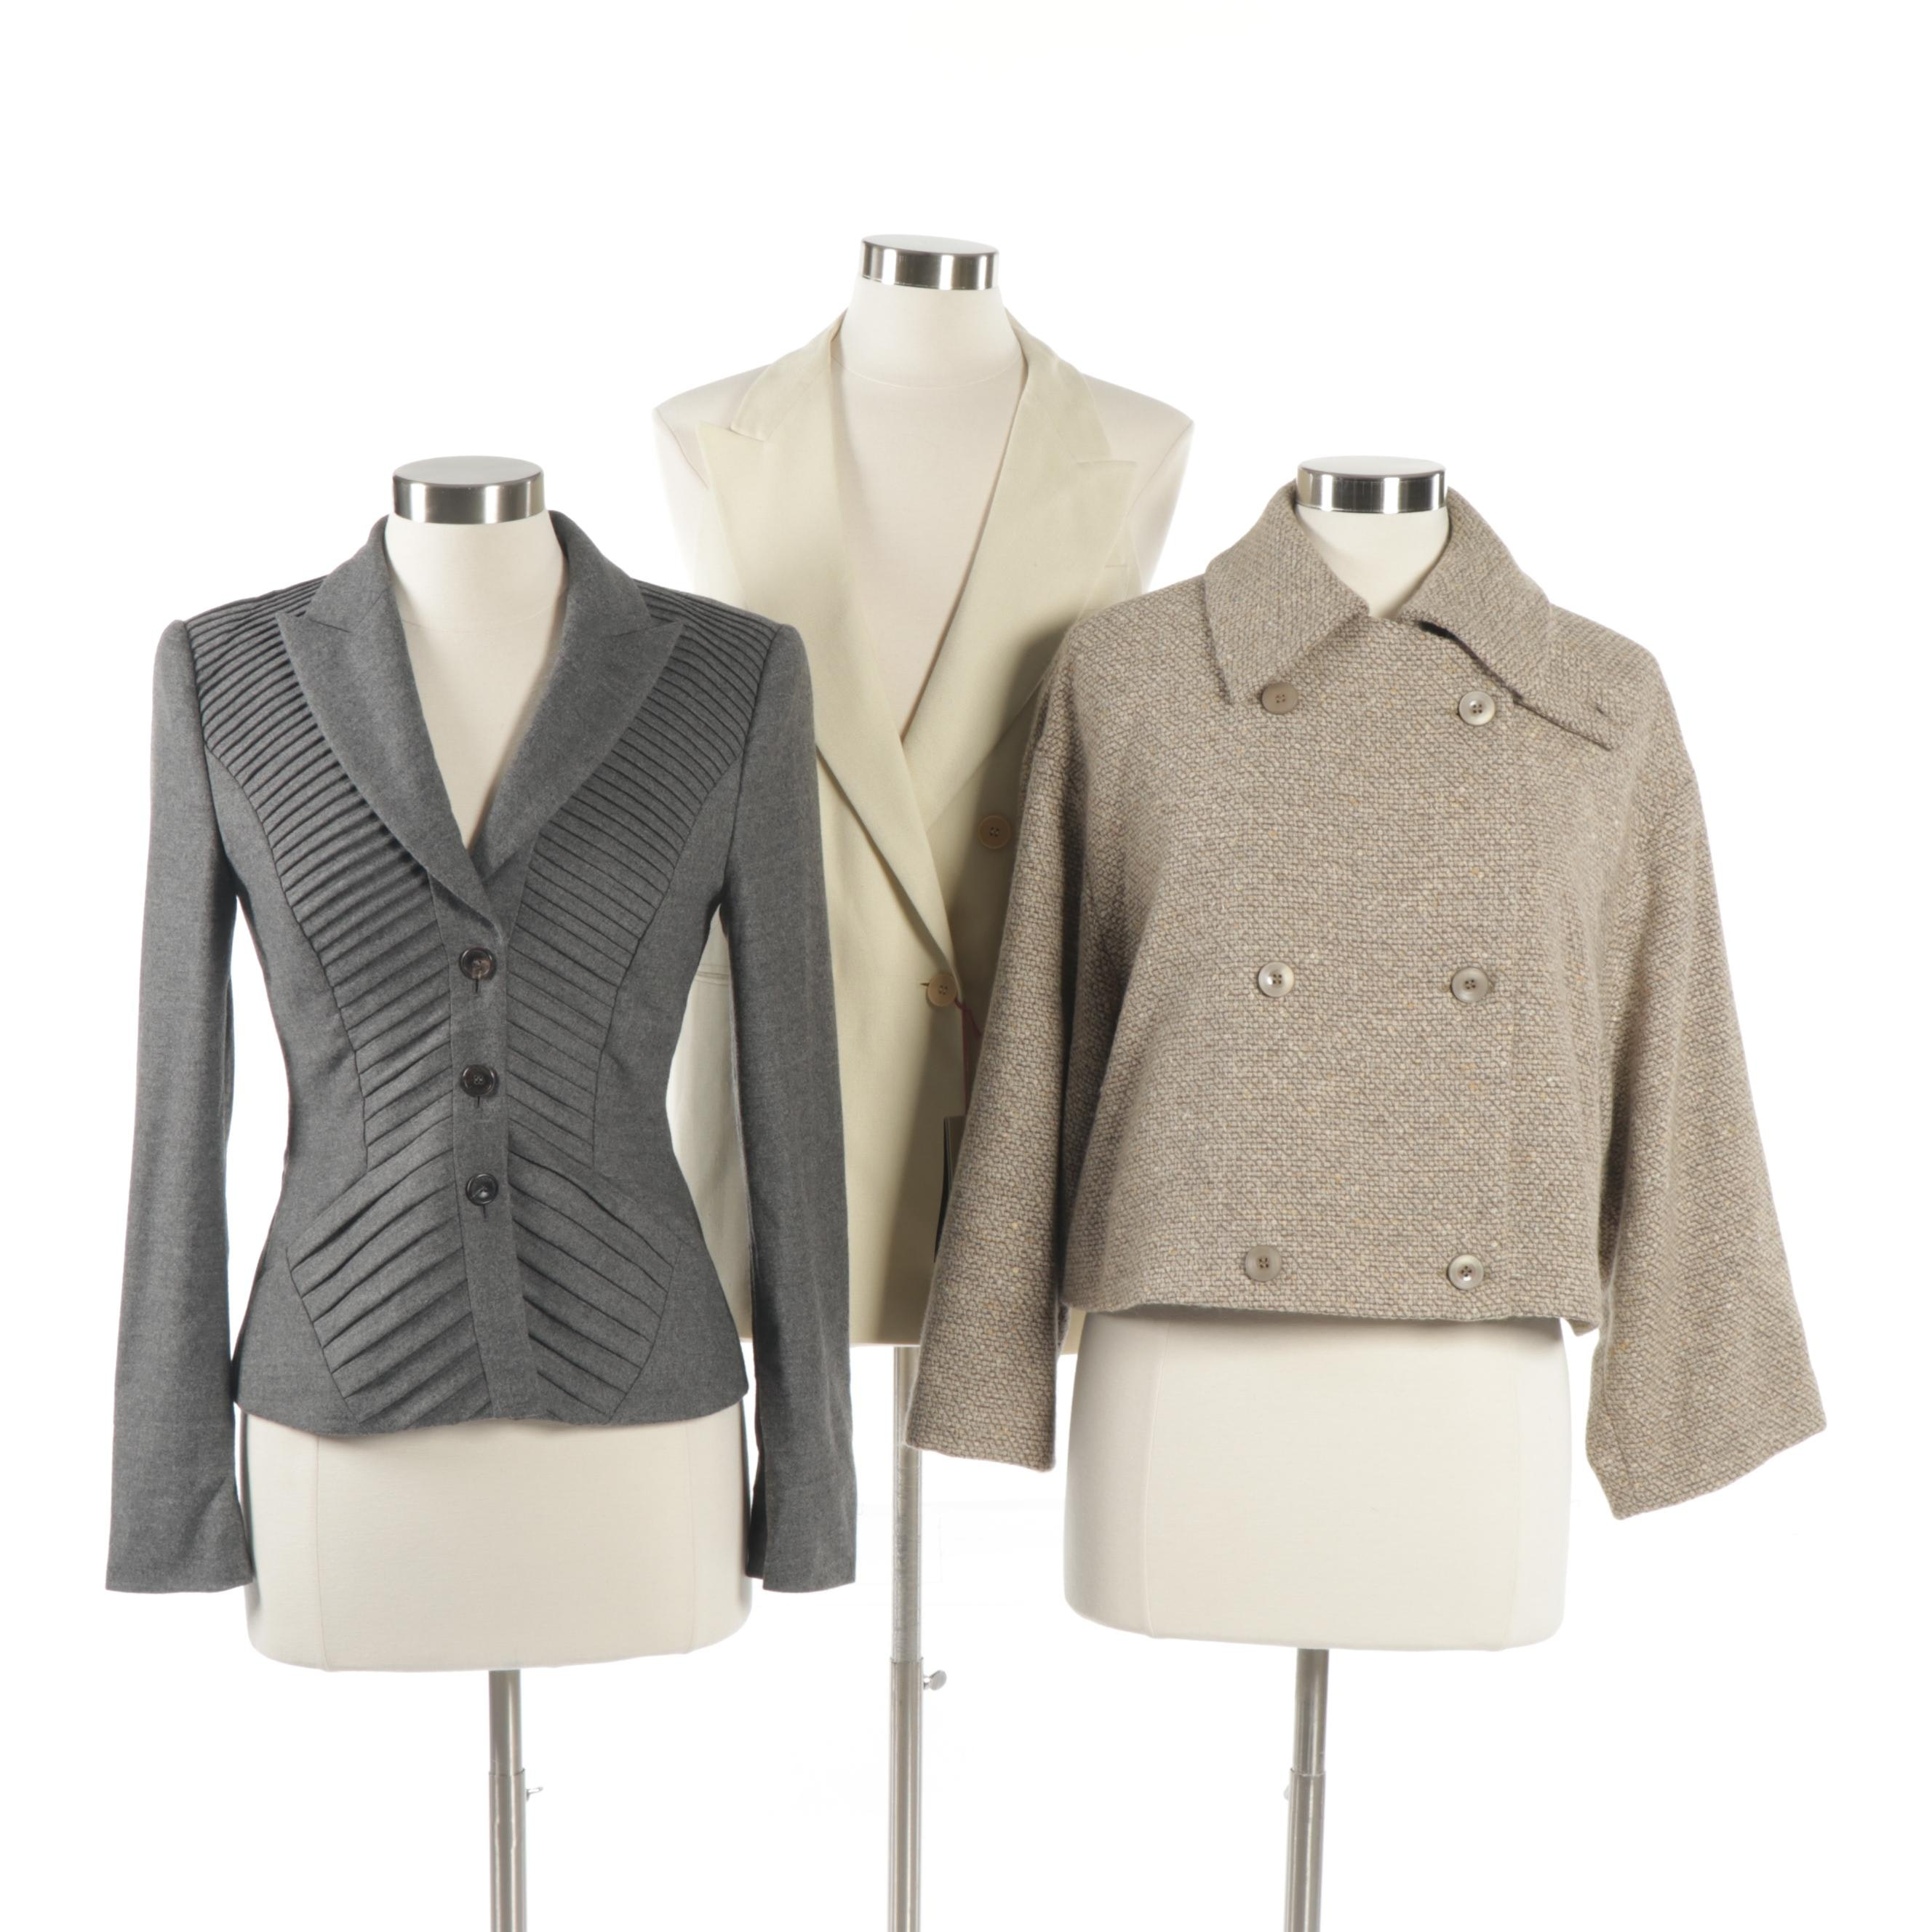 Designer Outerwear Featuring Escada and Stella McCartney